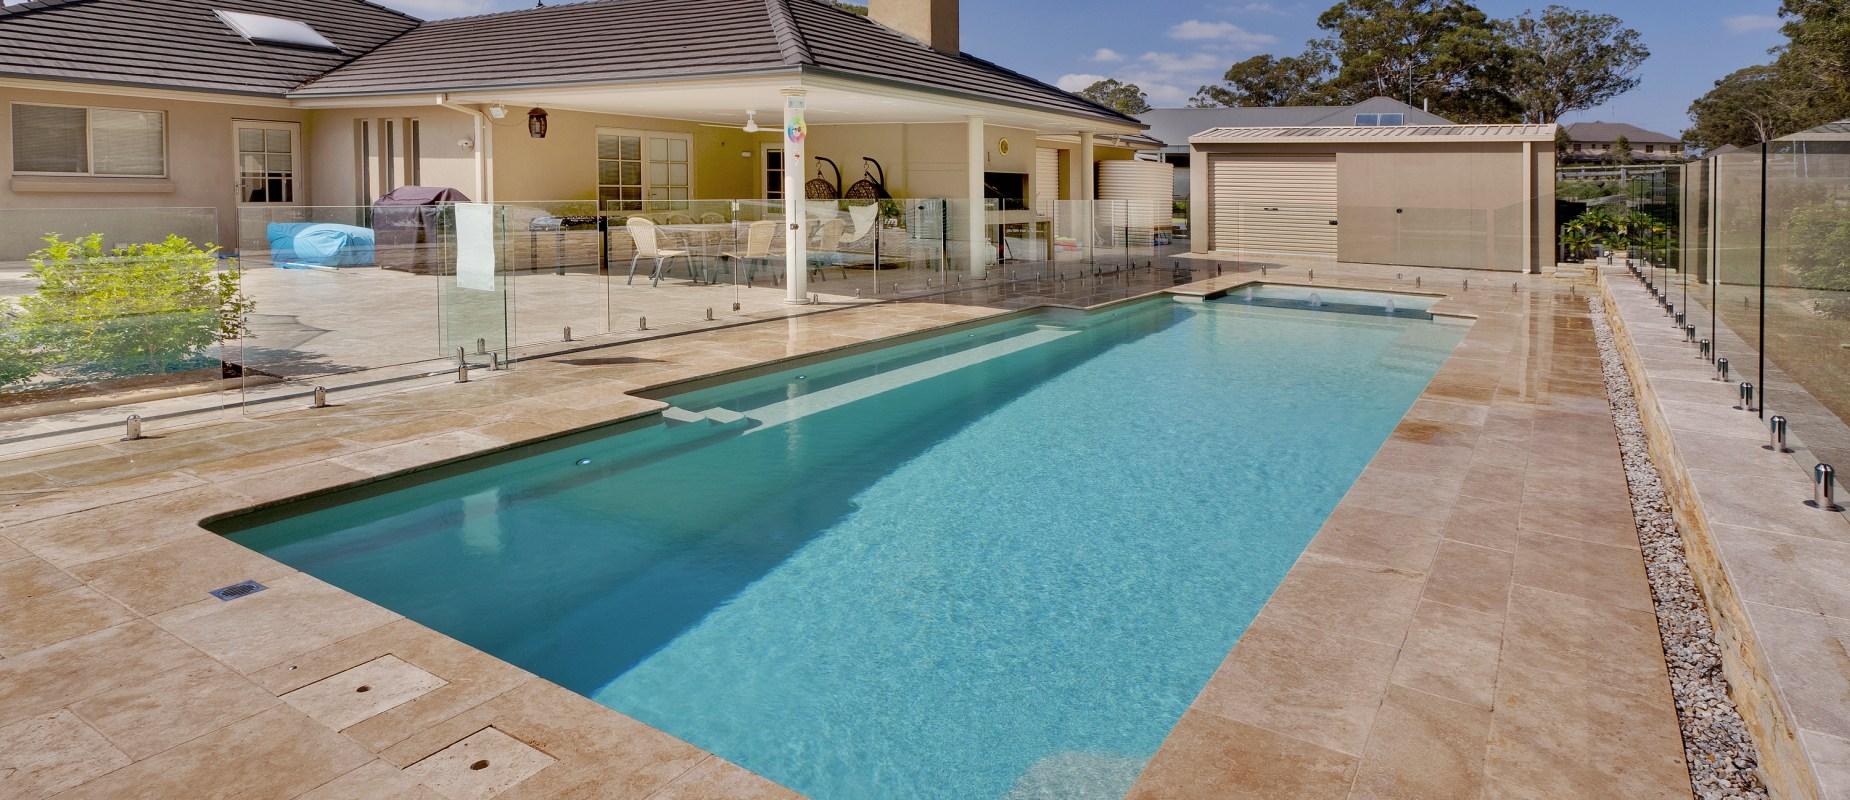 piscina de lux modele frumoase 34